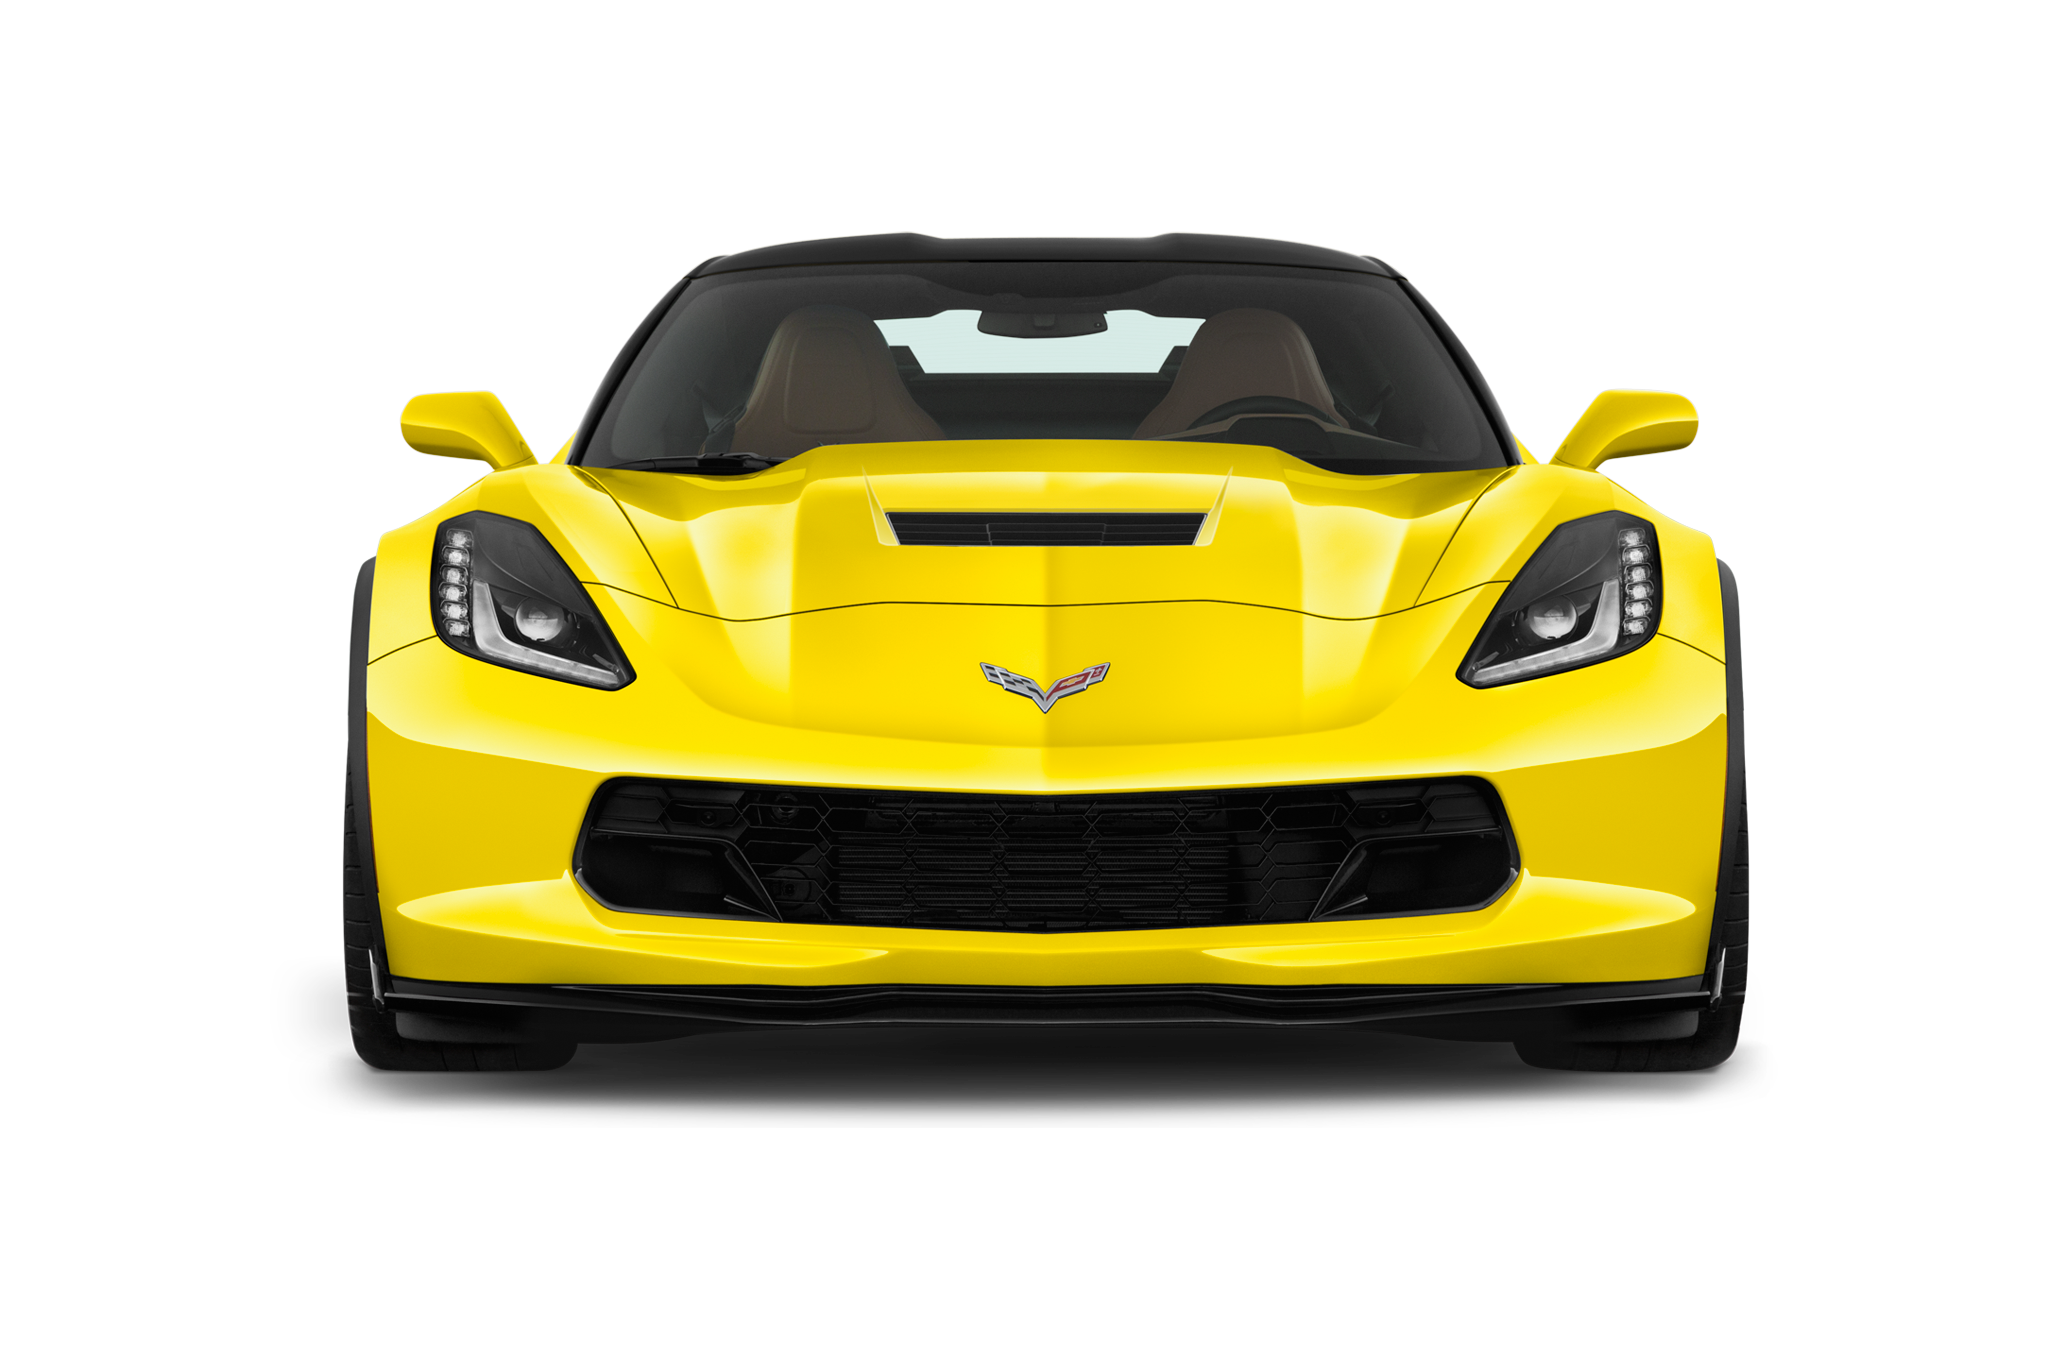 2019 chevrolet corvette zr1 to debut at 2017 dubai motor show